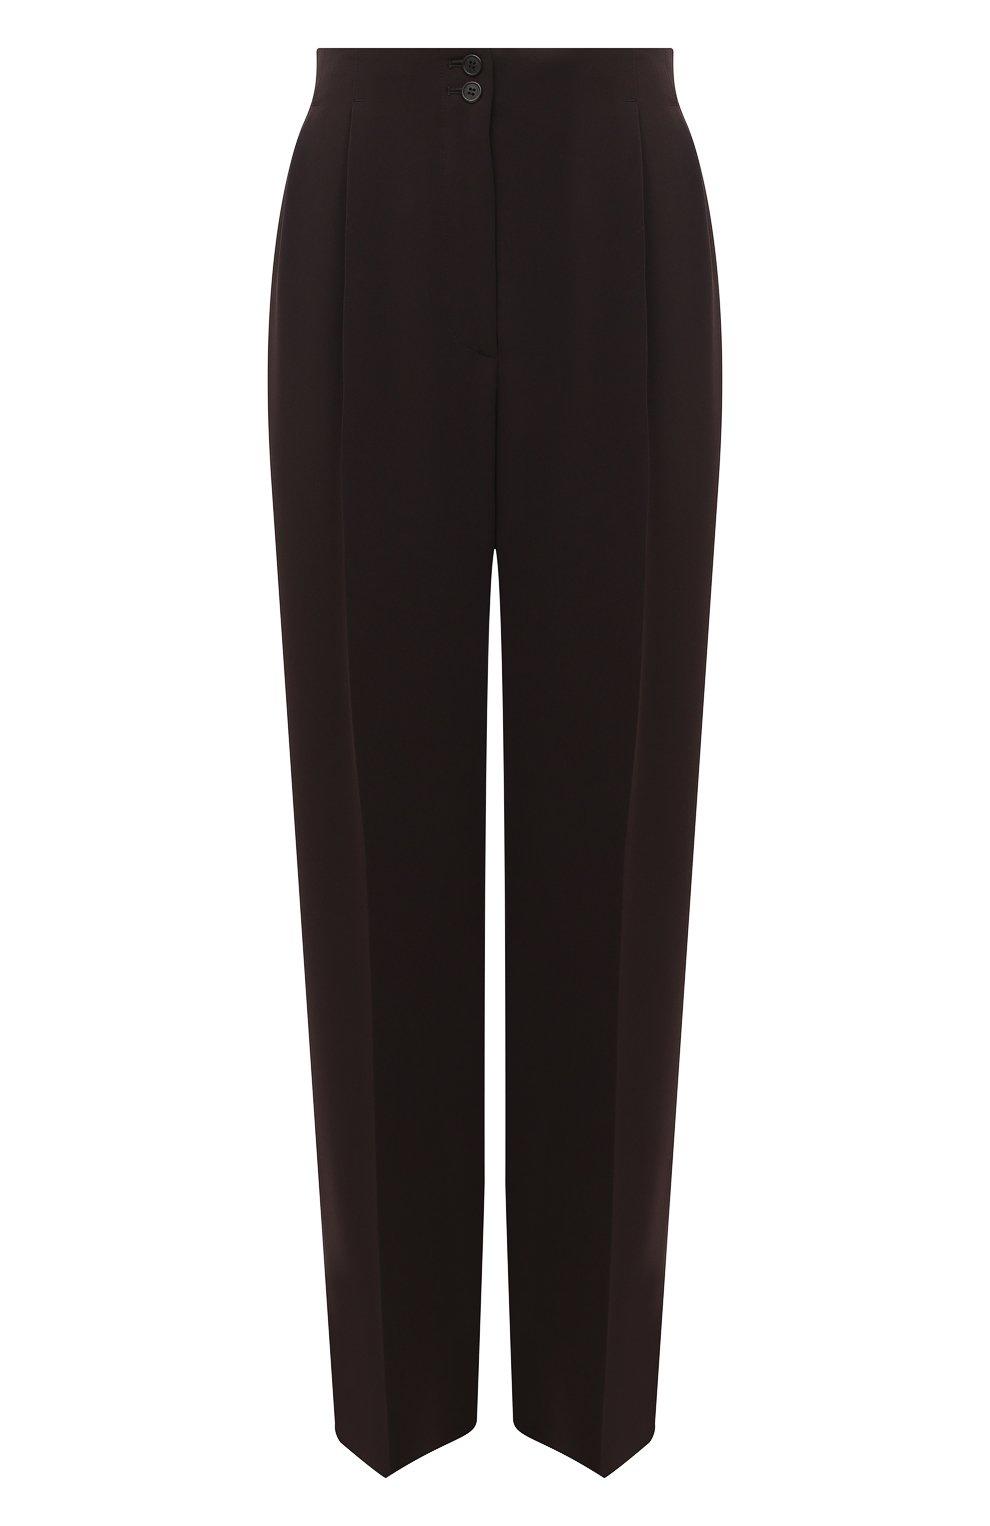 Женские брюки THE ROW темно-коричневого цвета, арт. 5475W1968   Фото 1